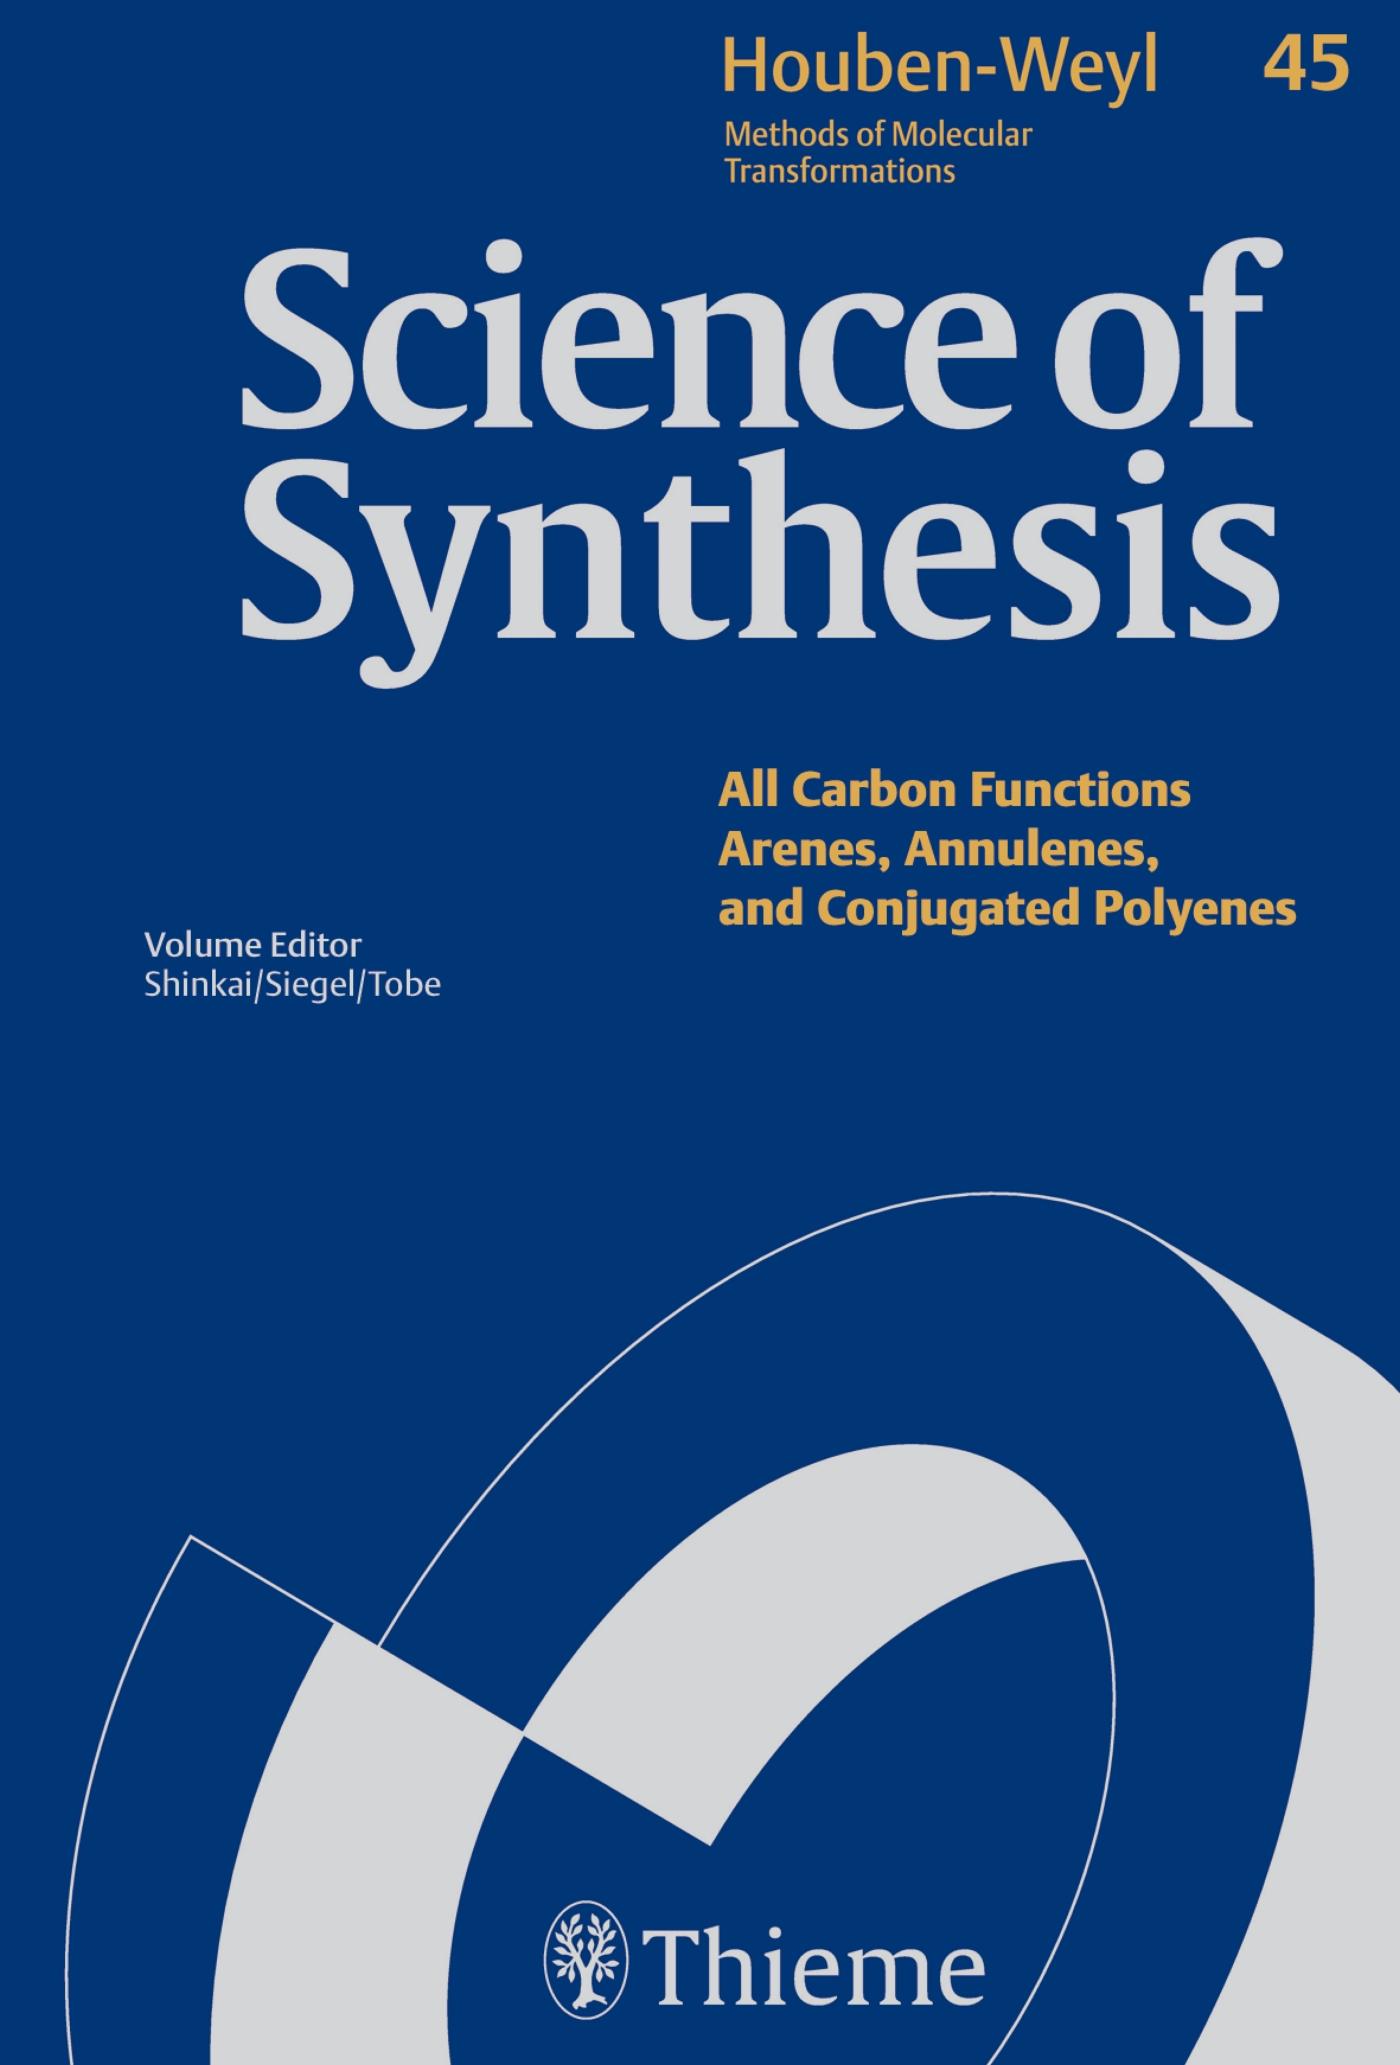 Science of Synthesis: Houben-Weyl Methods of Molecular Transformations  Vol. 45a